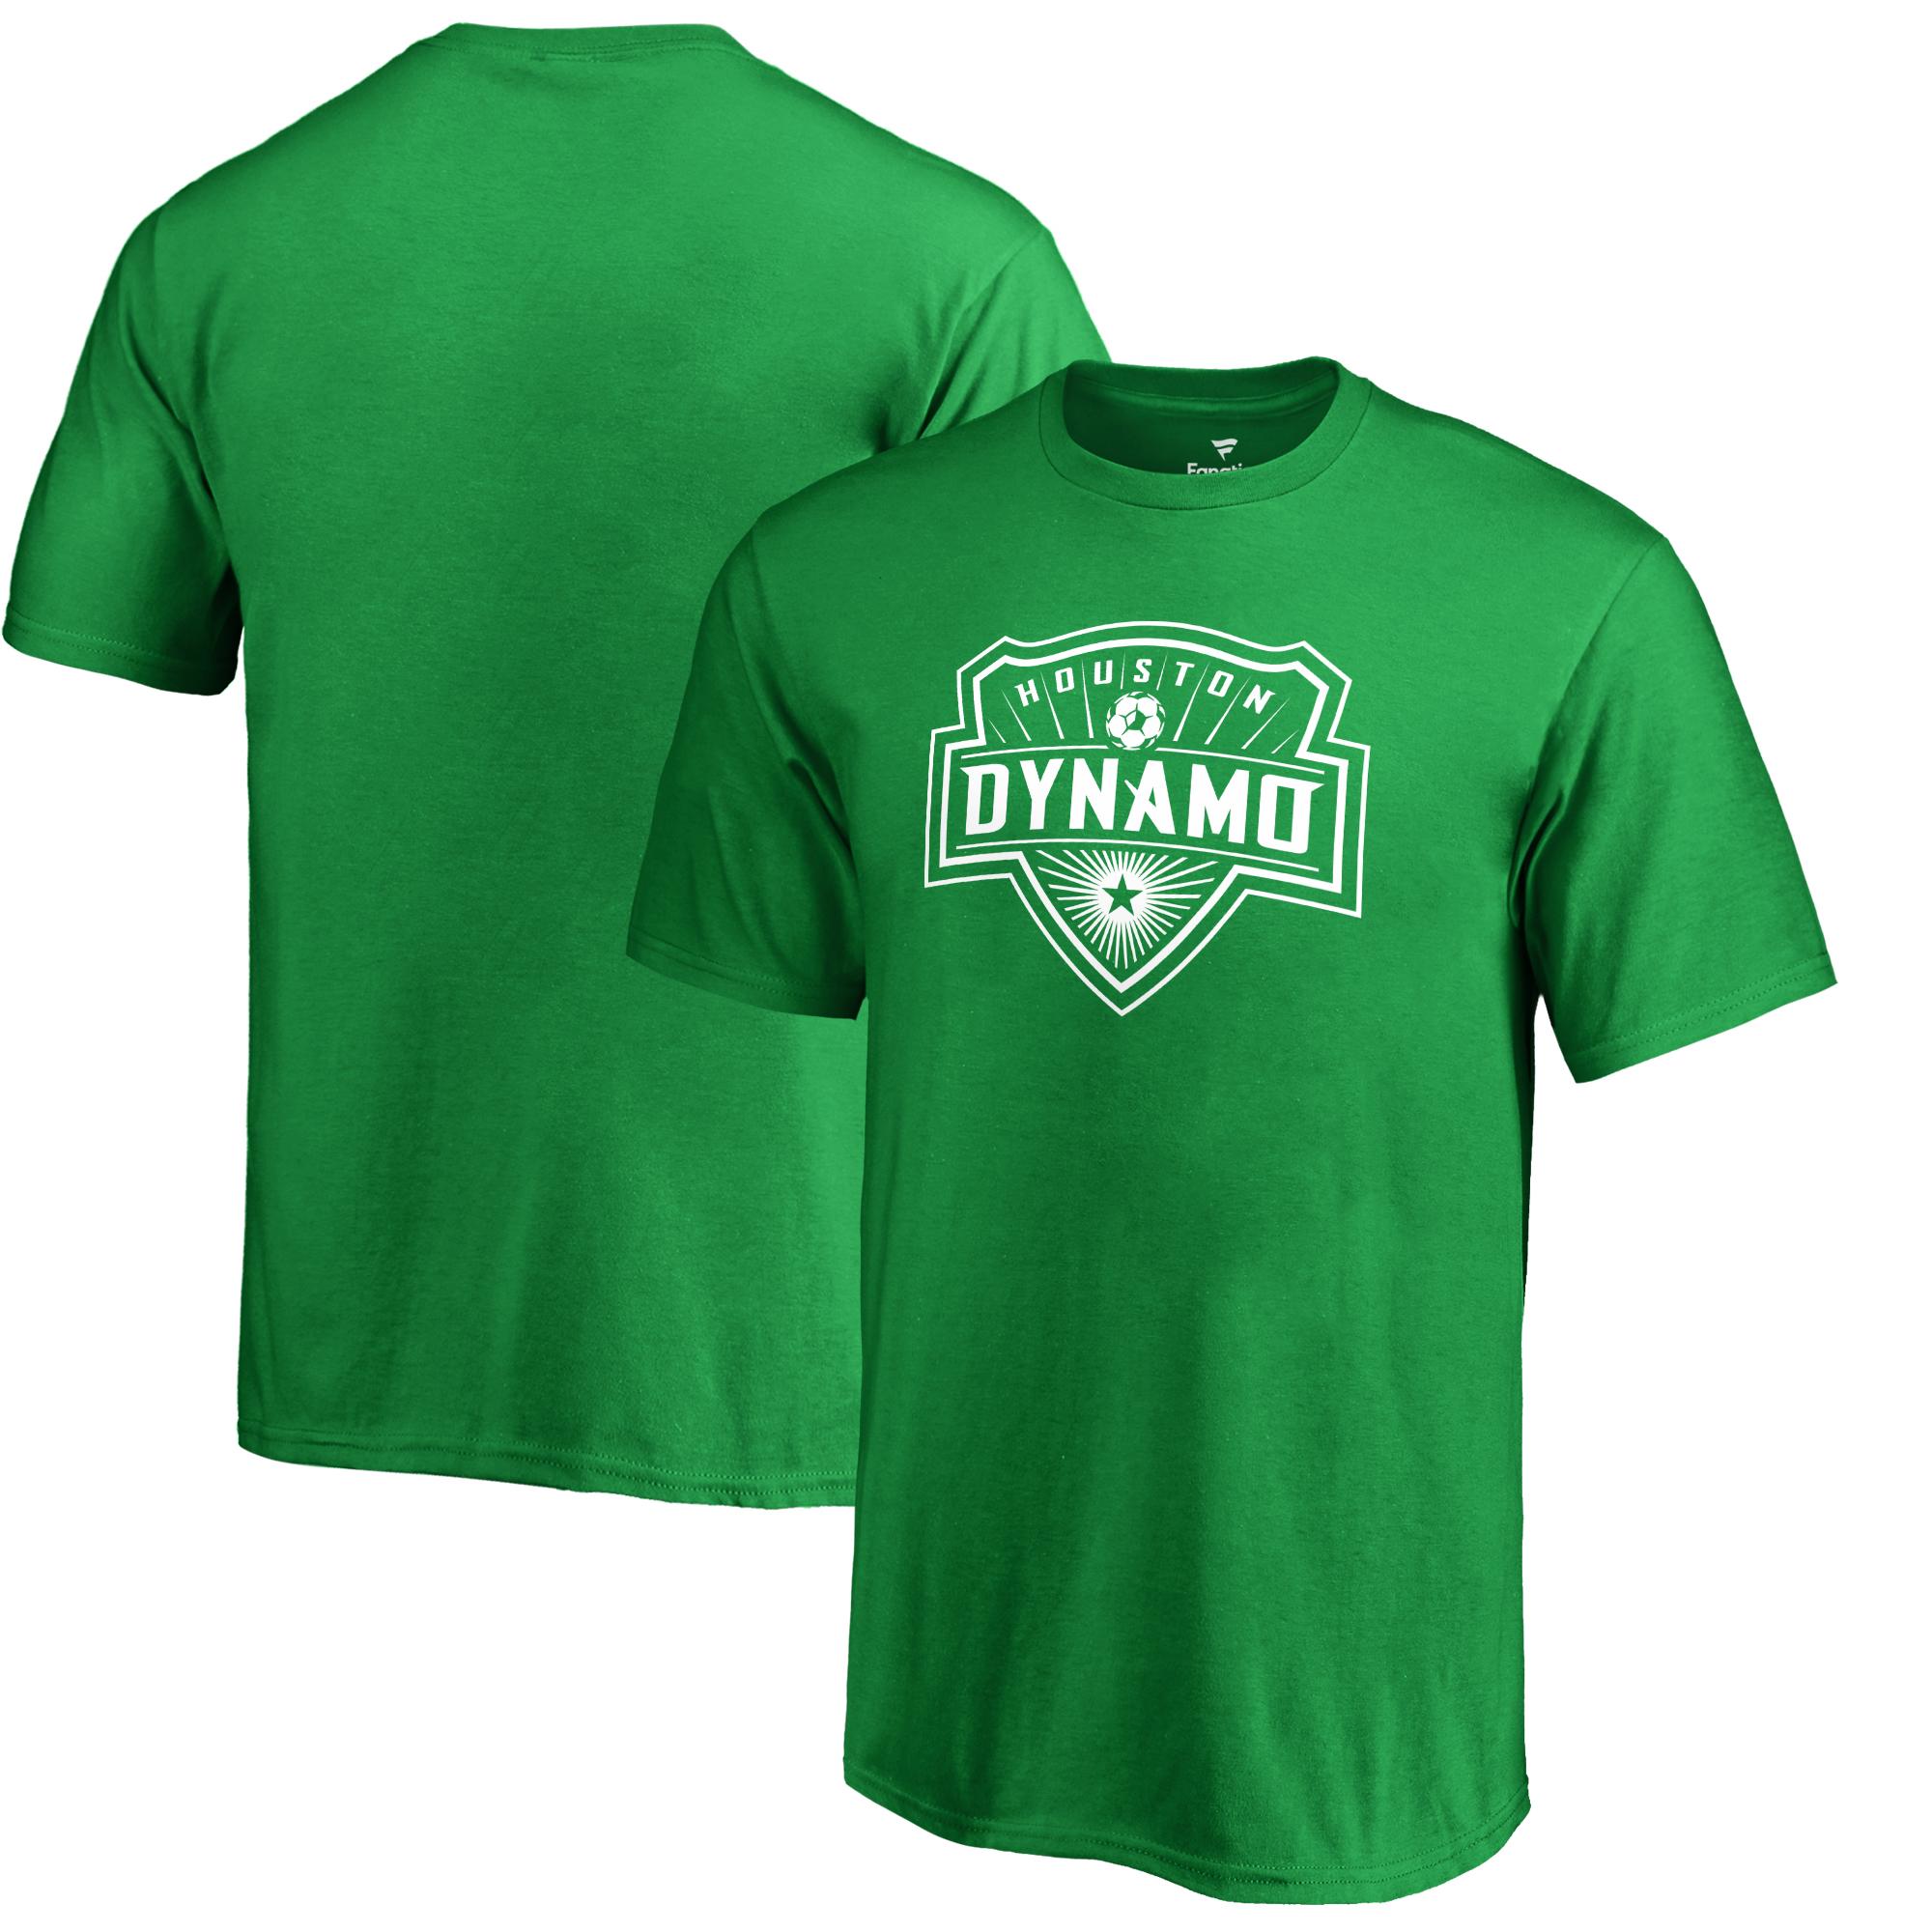 Houston Dynamo Fanatics Branded Youth St. Patrick's Day White Logo T-Shirt - Kelly Green